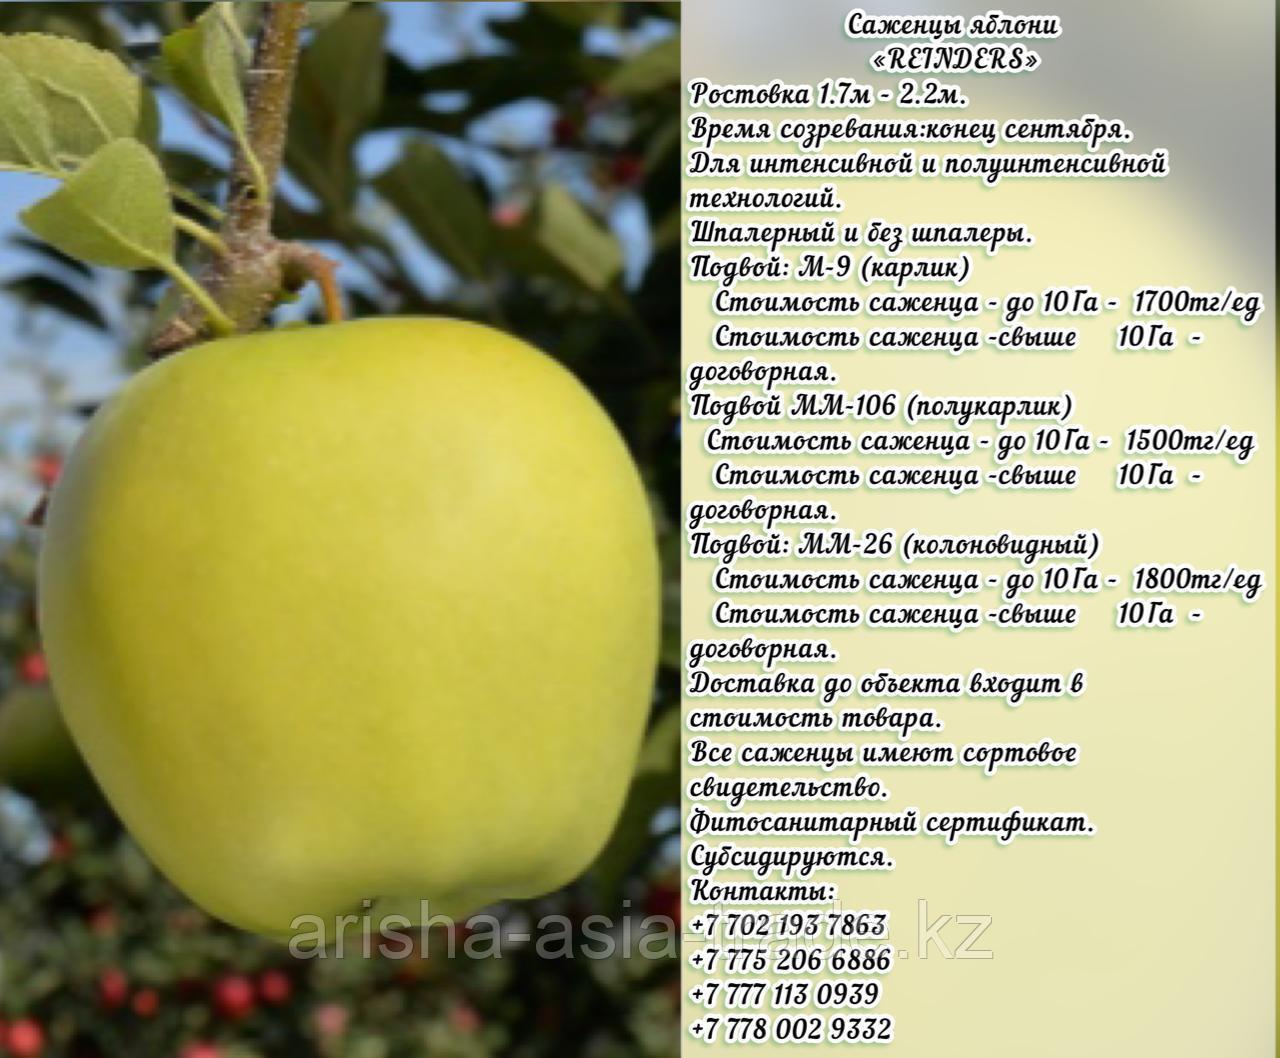 "Саженцы яблони ""Rainders"" (Рэндэрс) мм 26 Сербия"